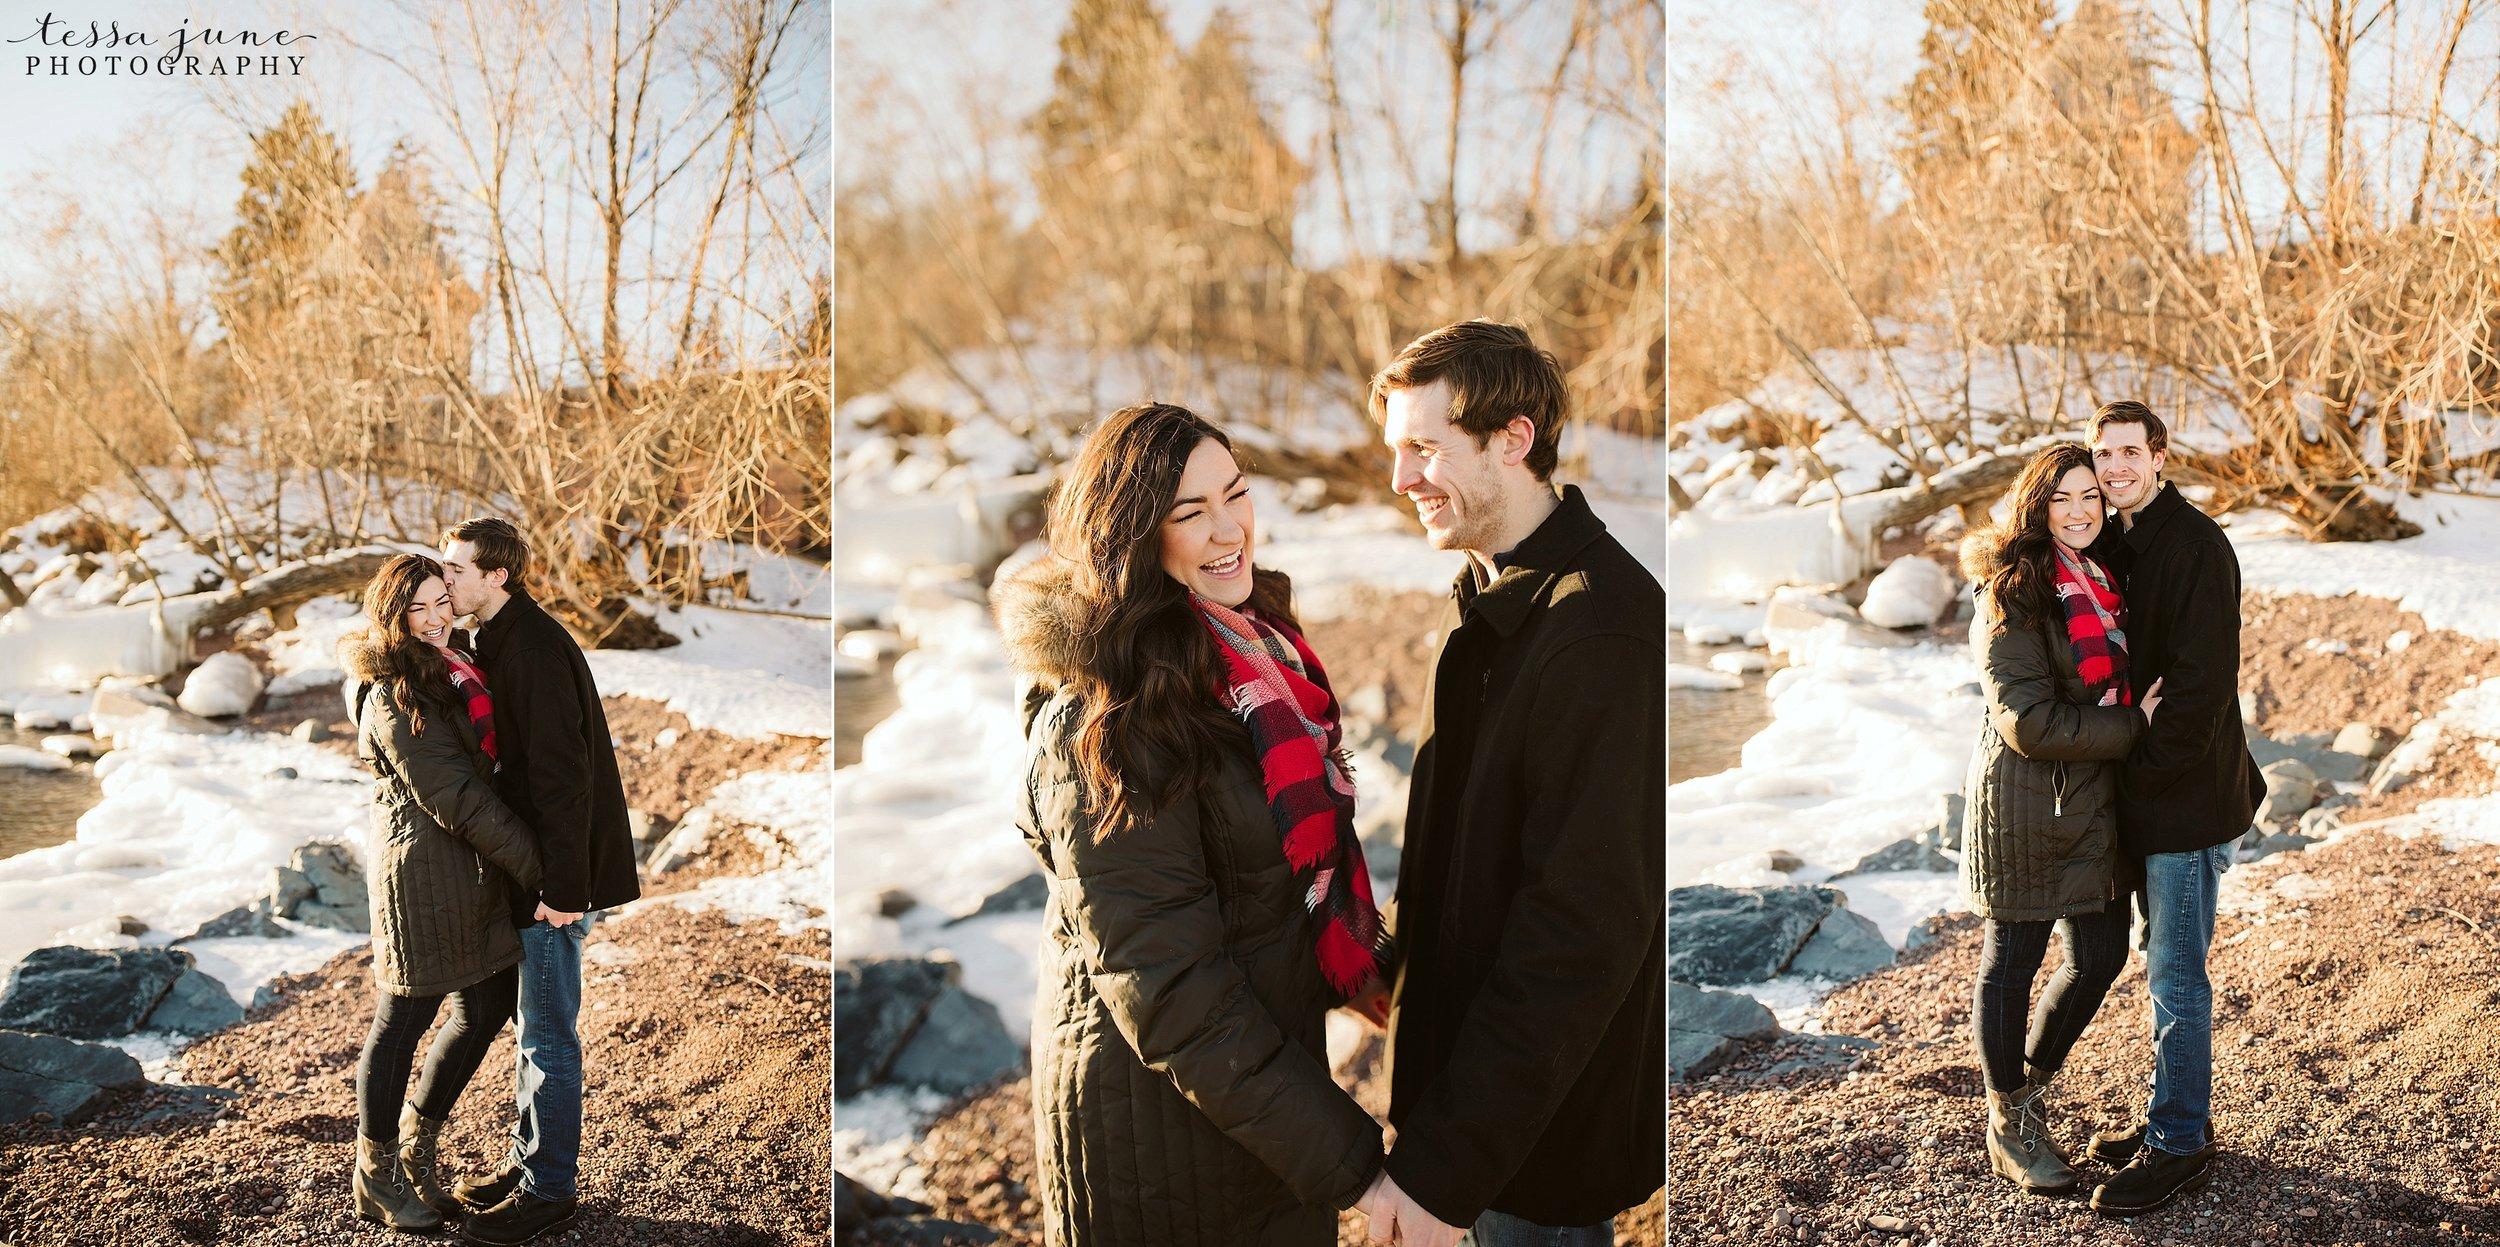 winter-duluth-engagement-at-park-pointe-snow-aly-alex-19.jpg